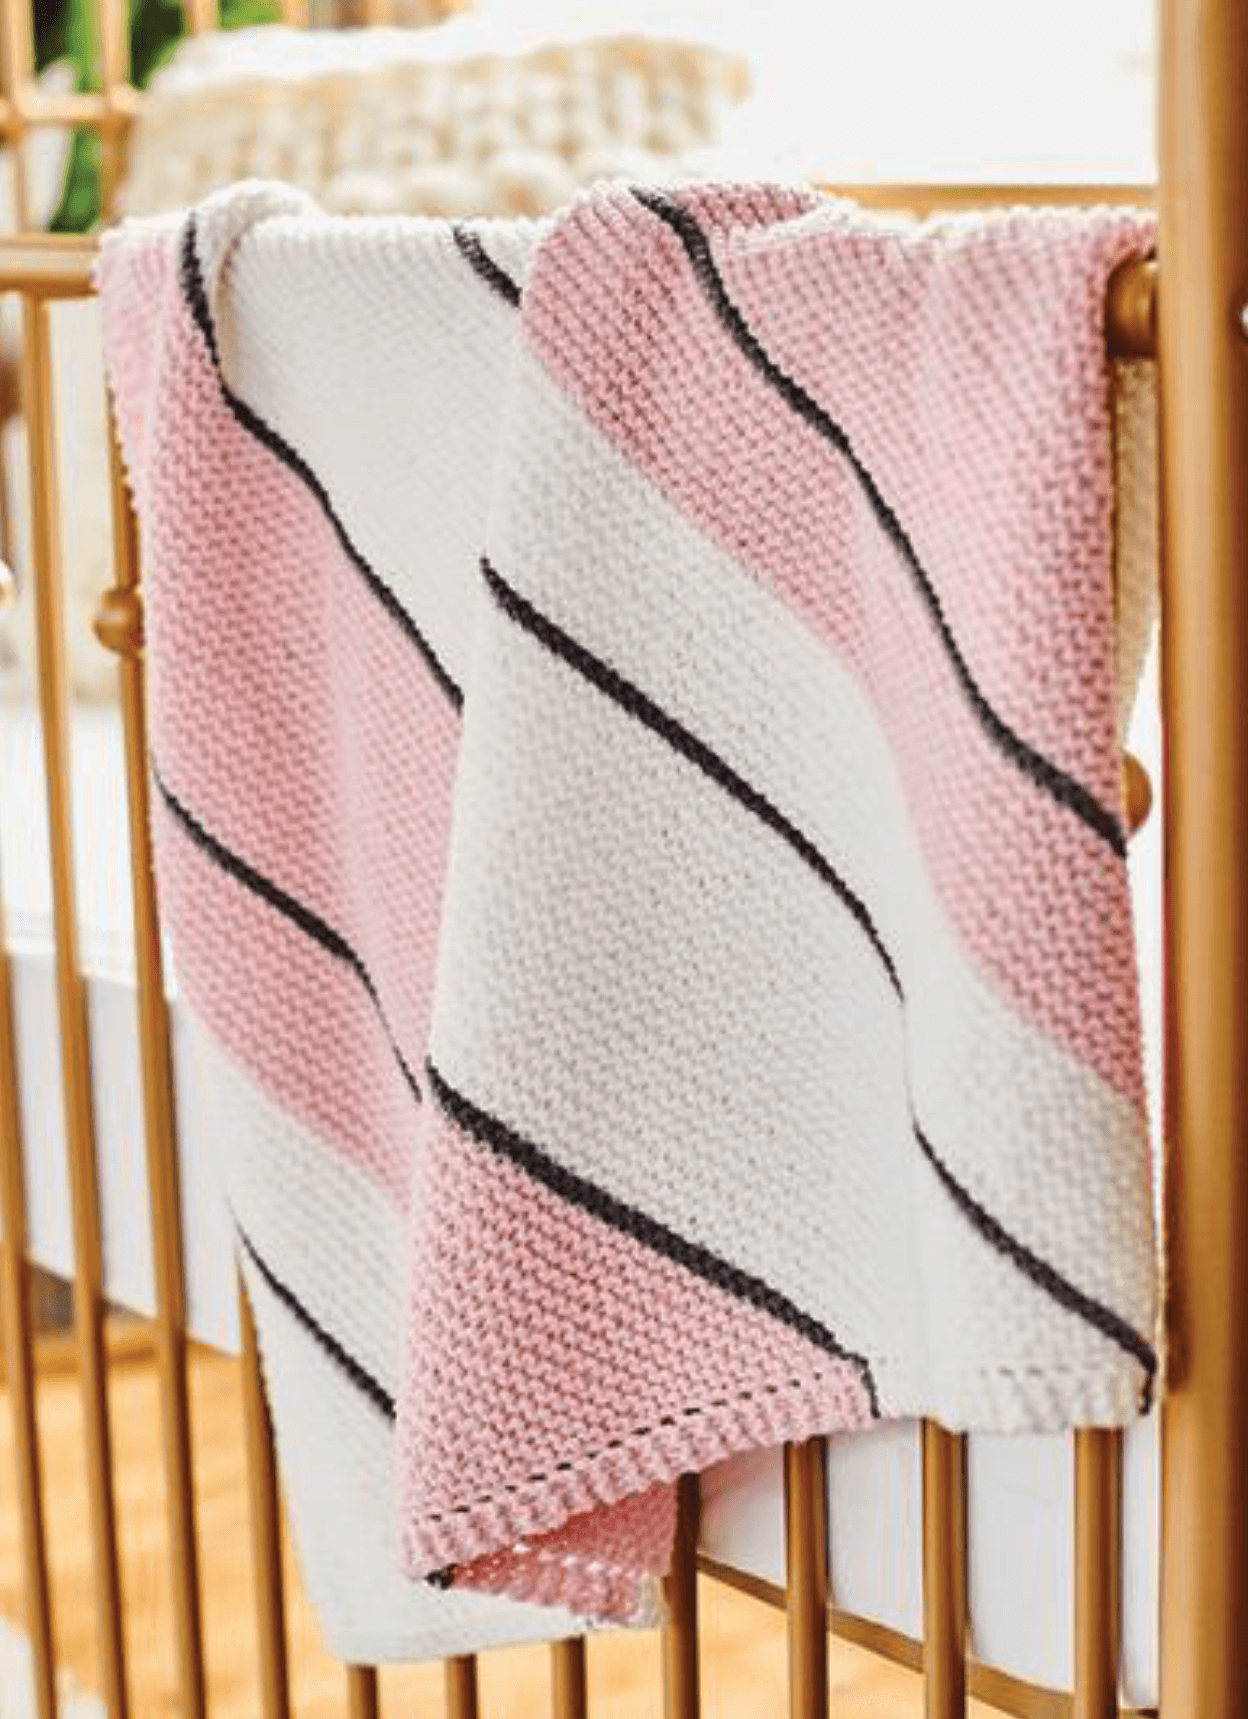 I wanna knit a baby blanket knitting patter